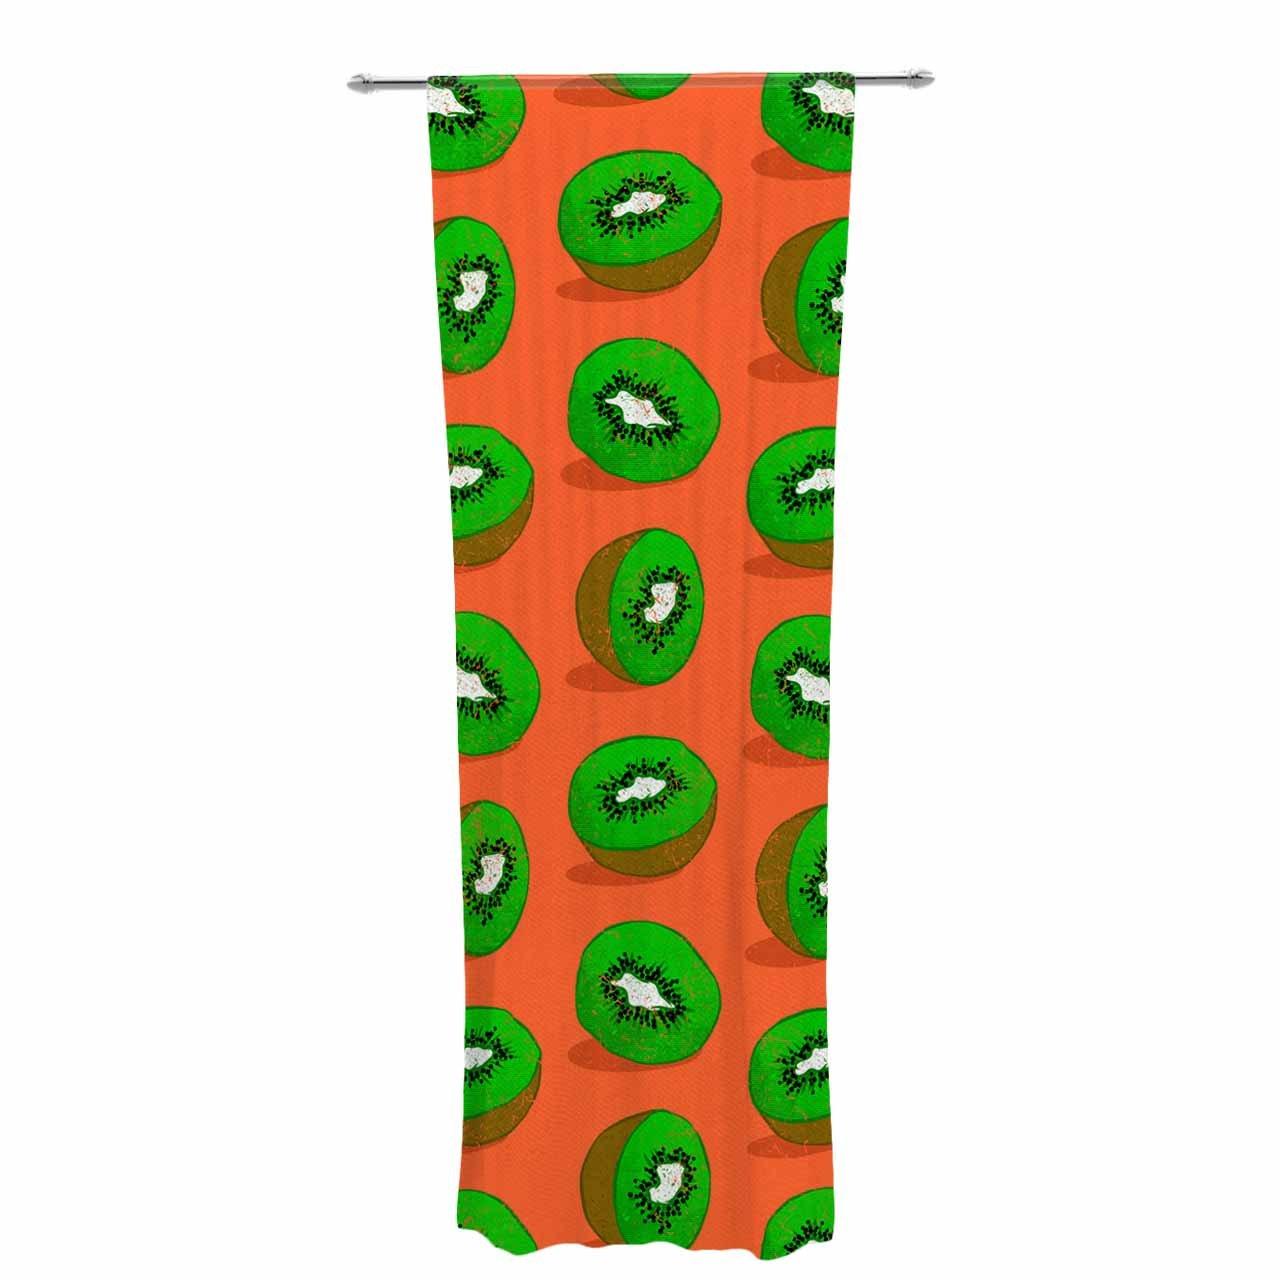 2 x 3 Floor Mat Kess InHouse Evgenia Kiwifruit Orange Green Decorative Door